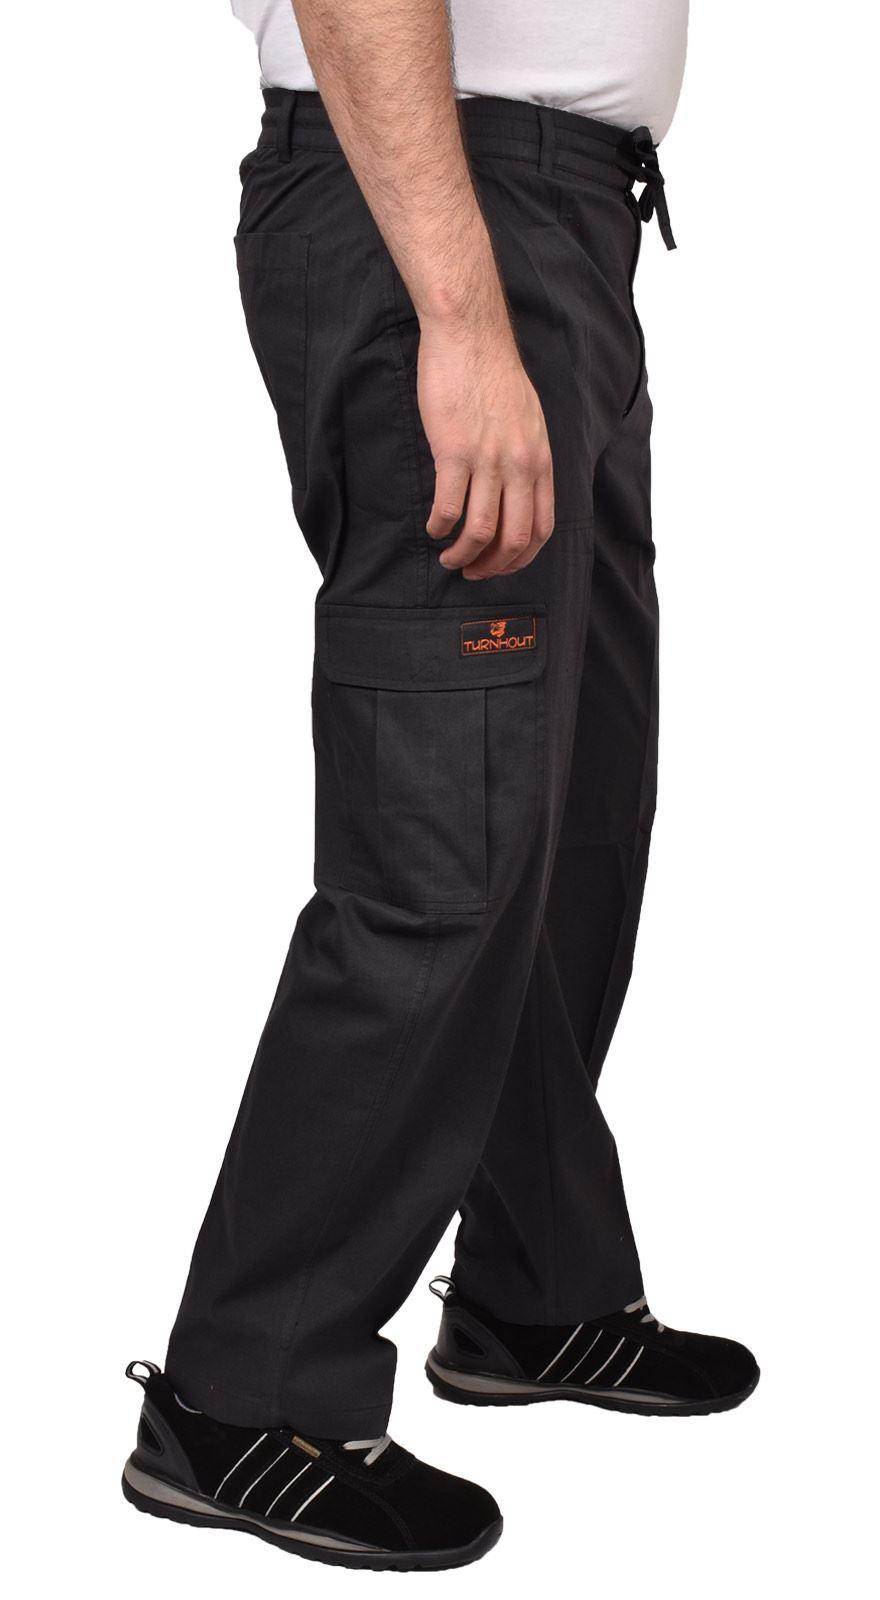 Para-Hombre-De-Carga-Combate-Pantalones-De-Trabajo-Bolsillos-Patrulla-Tactico-Pro-Algodon-Pantalones miniatura 9